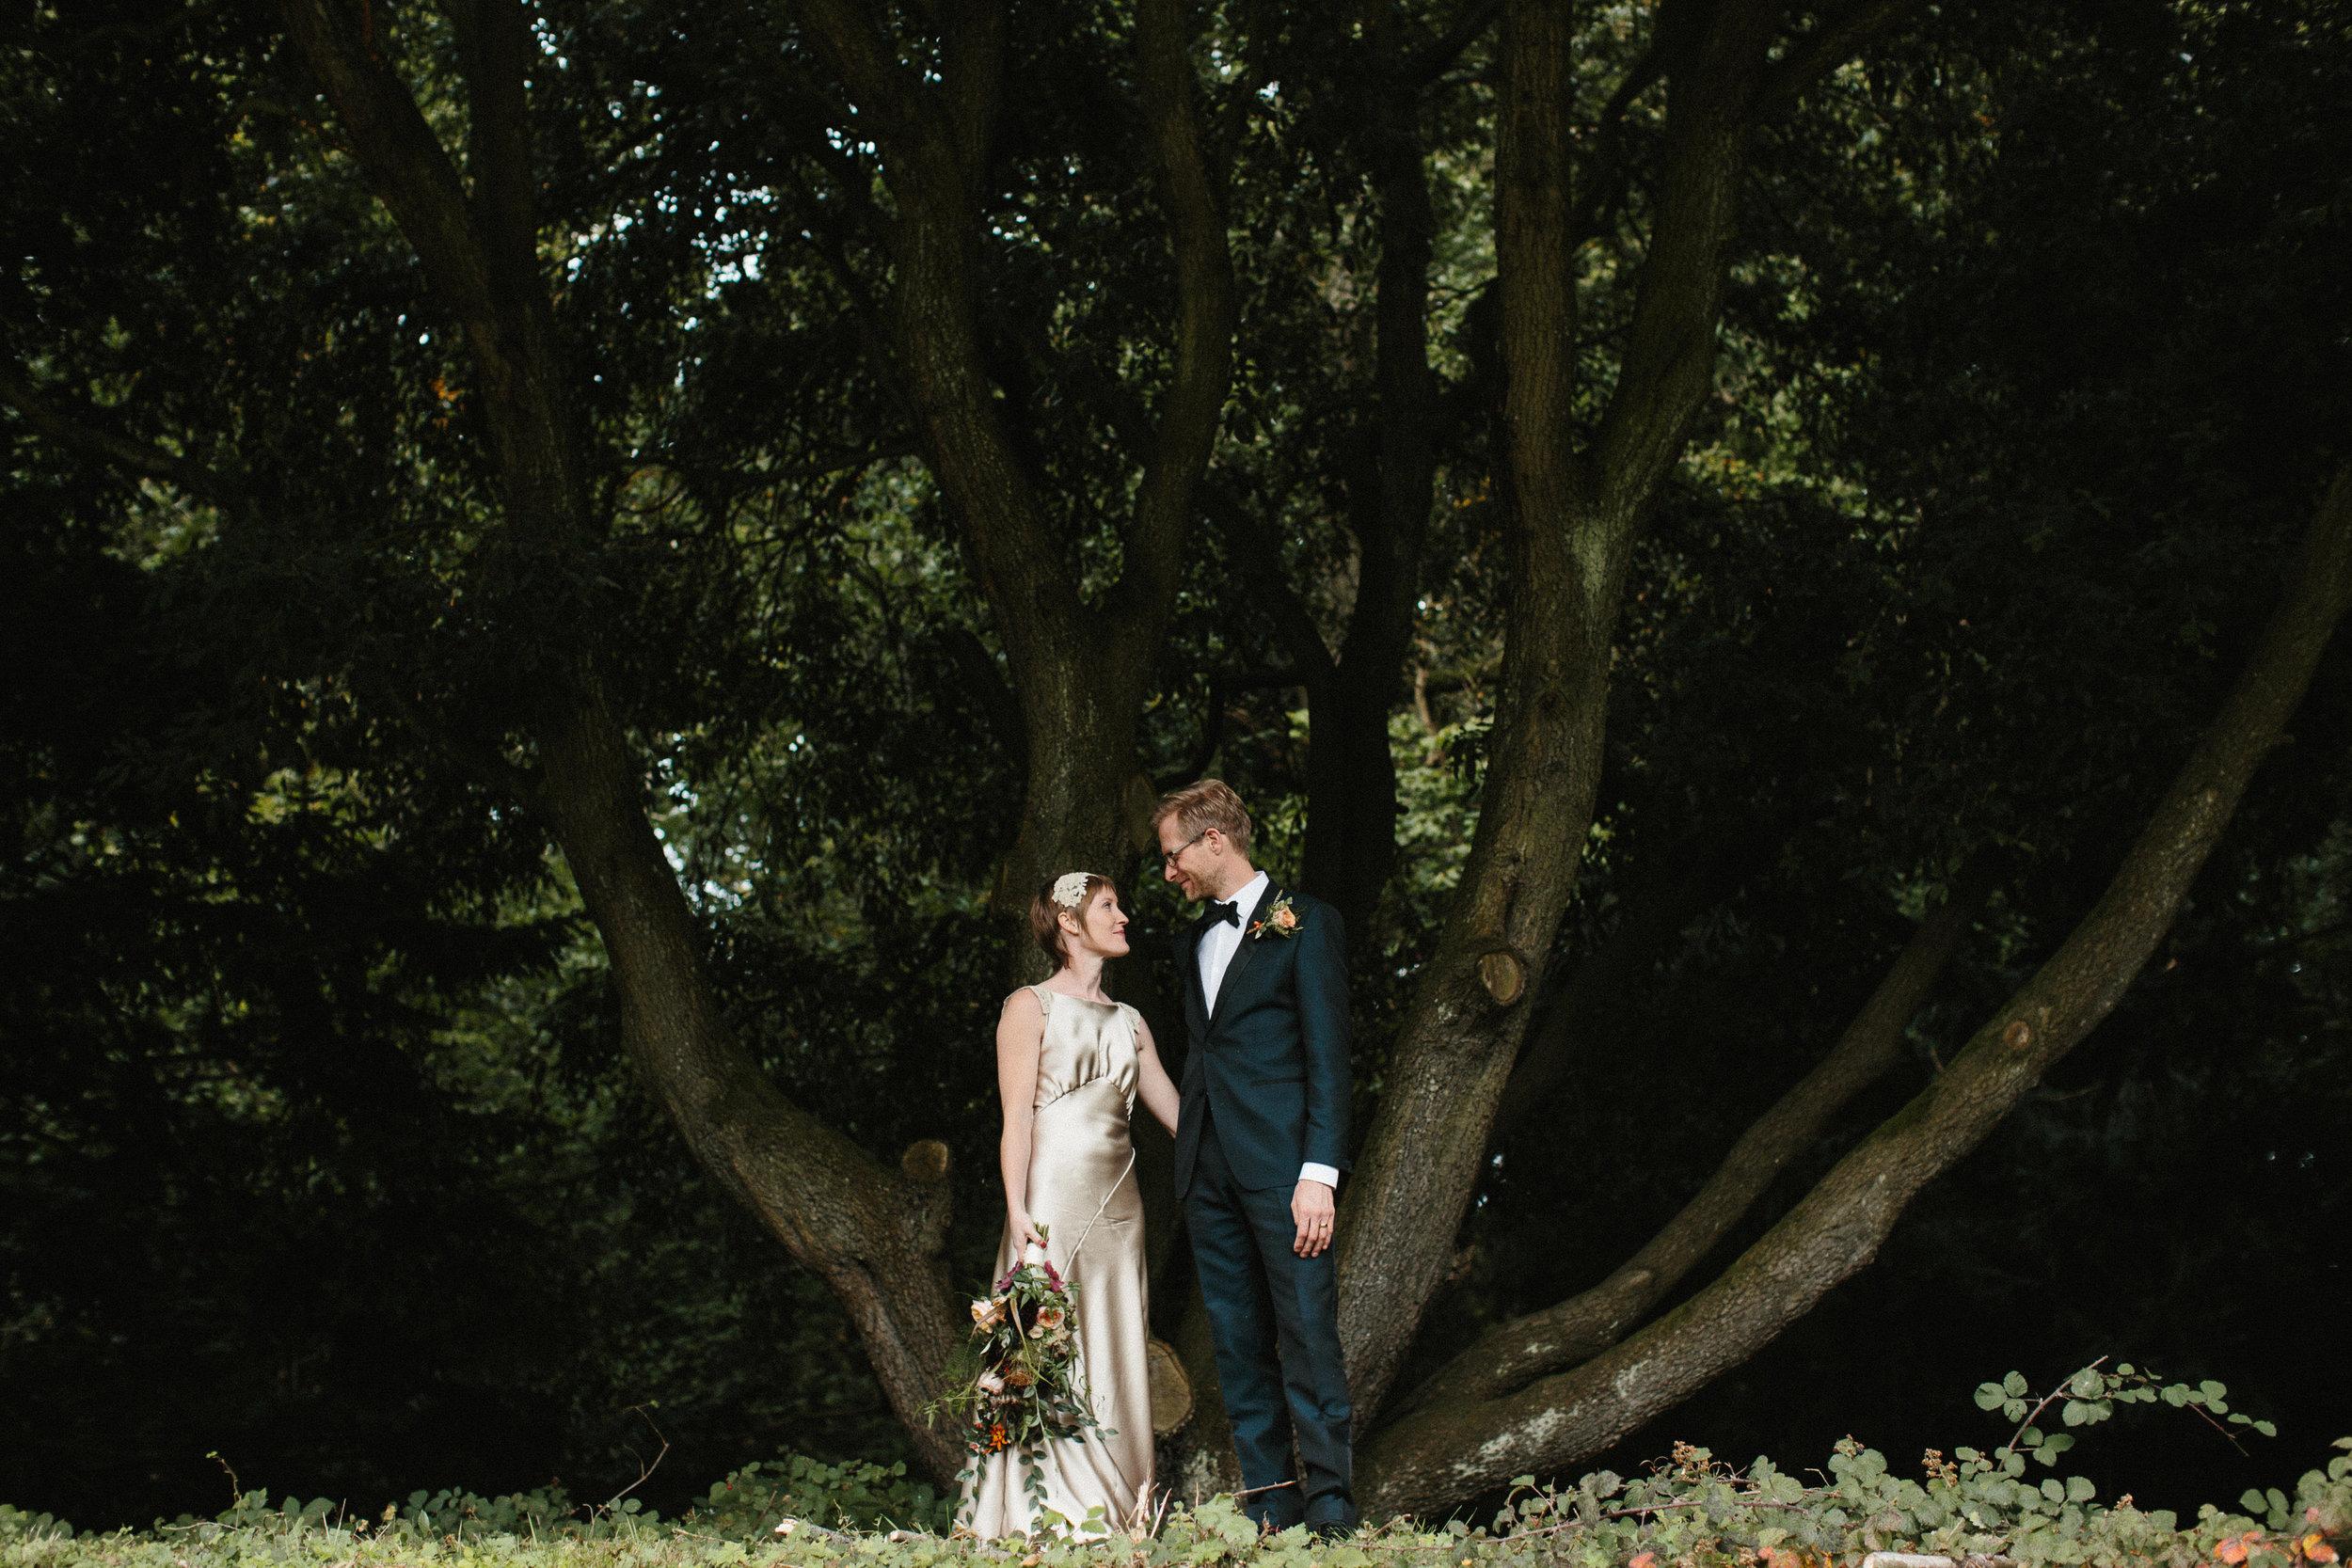 Kate-Beaumont-Sheffield-Honeysuckle-bias-cut-wedding-dress-oyster-Rosie28.jpg